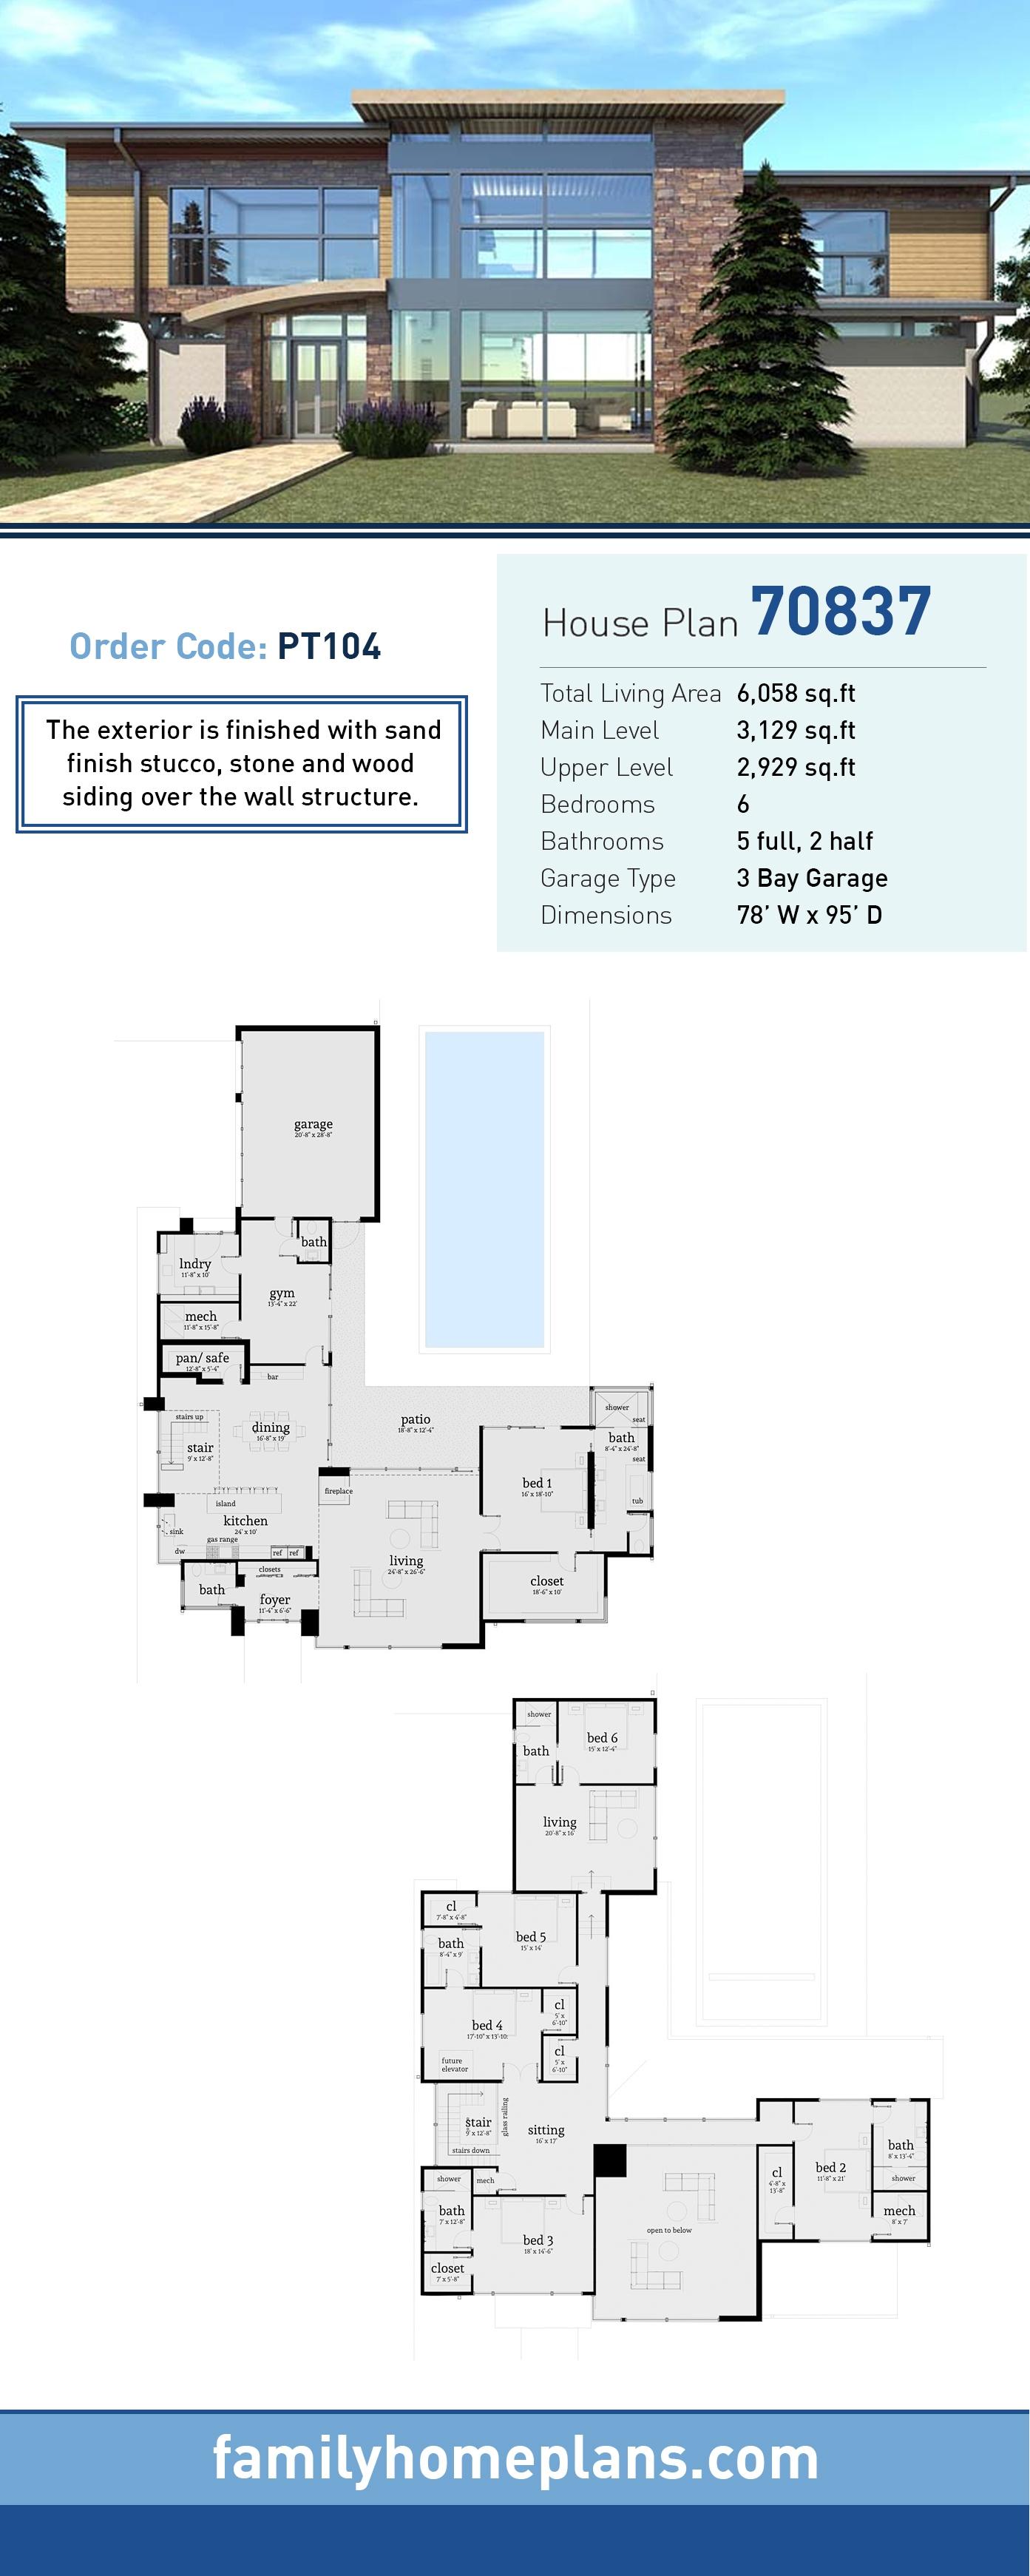 Modern House Plan 70837 with 6 Beds, 7 Baths, 3 Car Garage